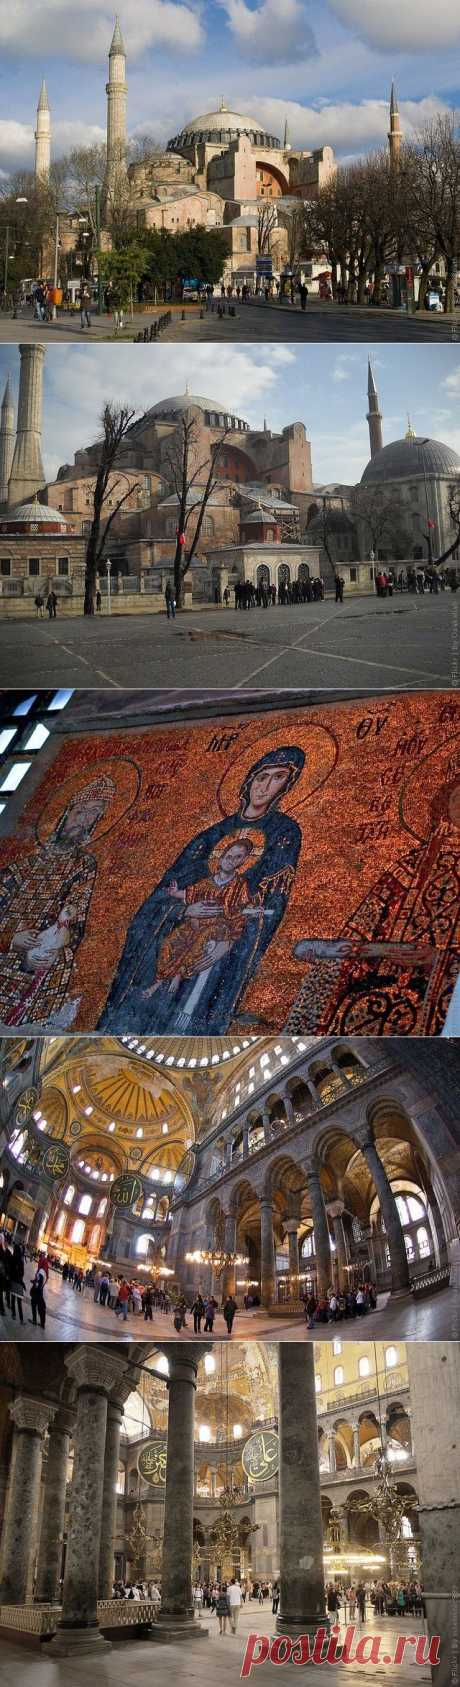 Собор Святой Софии в Стамбуле, фото и описание собора